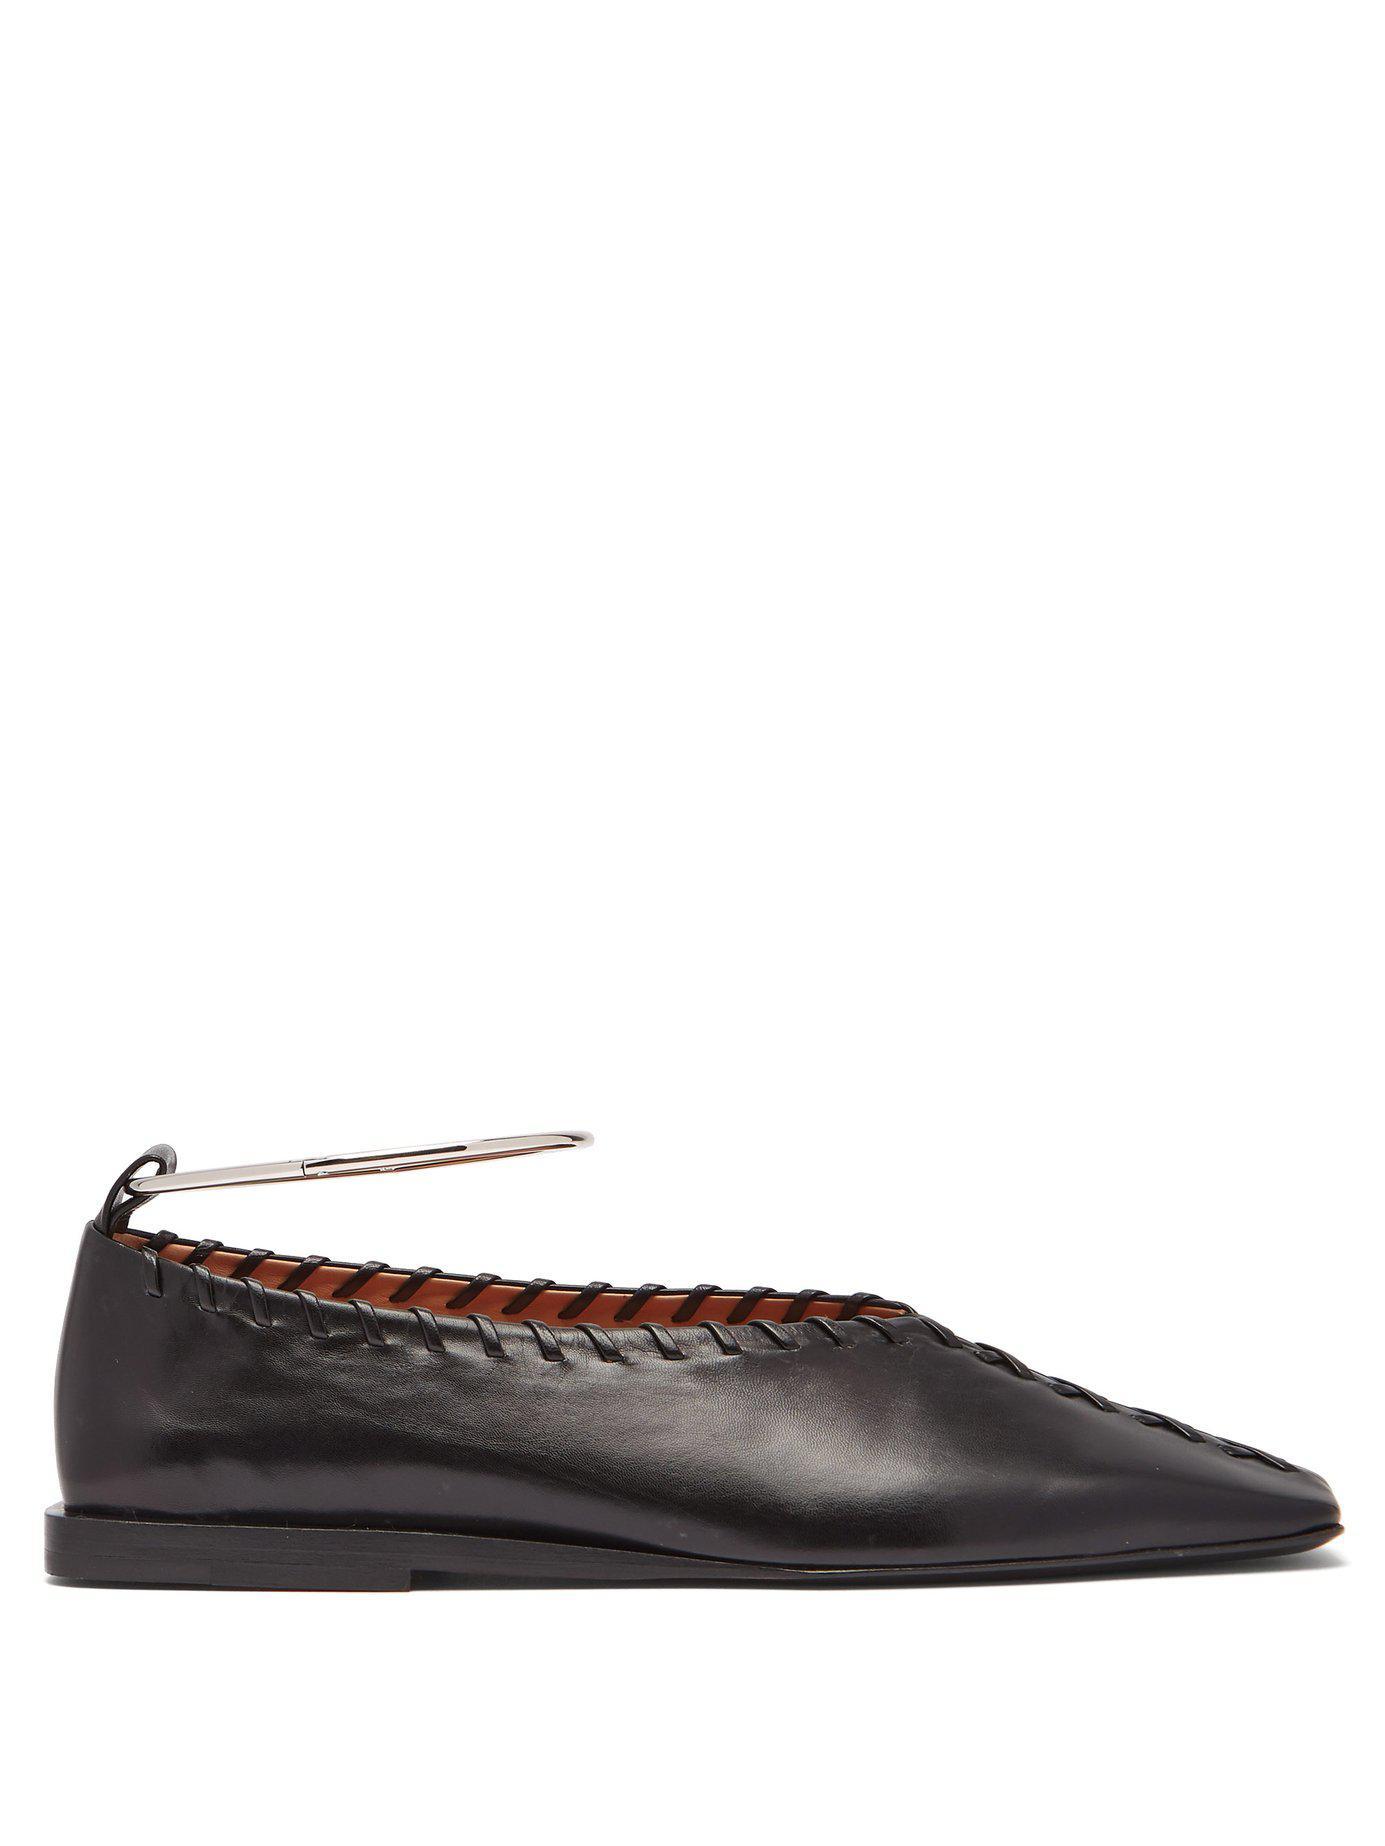 8877dd53105 Lyst - Jil Sander Whipstiched Leather Ballet Flats in Black